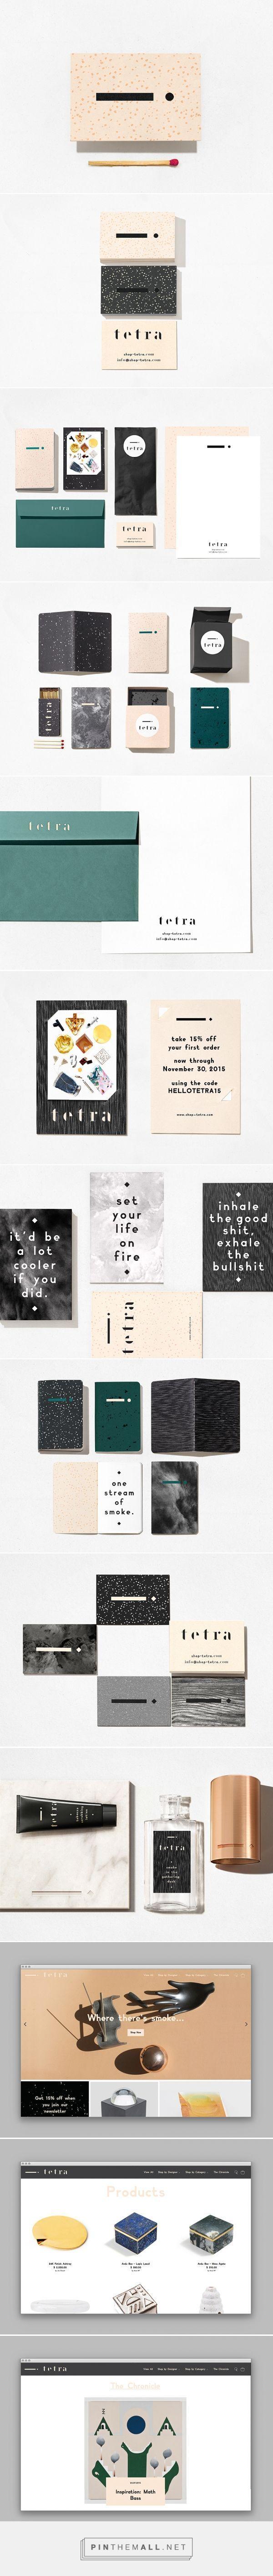 Tetra Smoke Shop Branding by Studio AH-HA | Fivestar Branding Agency – Design and Branding Agency & Curated Inspiration Gallery #branding #brand #brandidentity #design #designinspiration